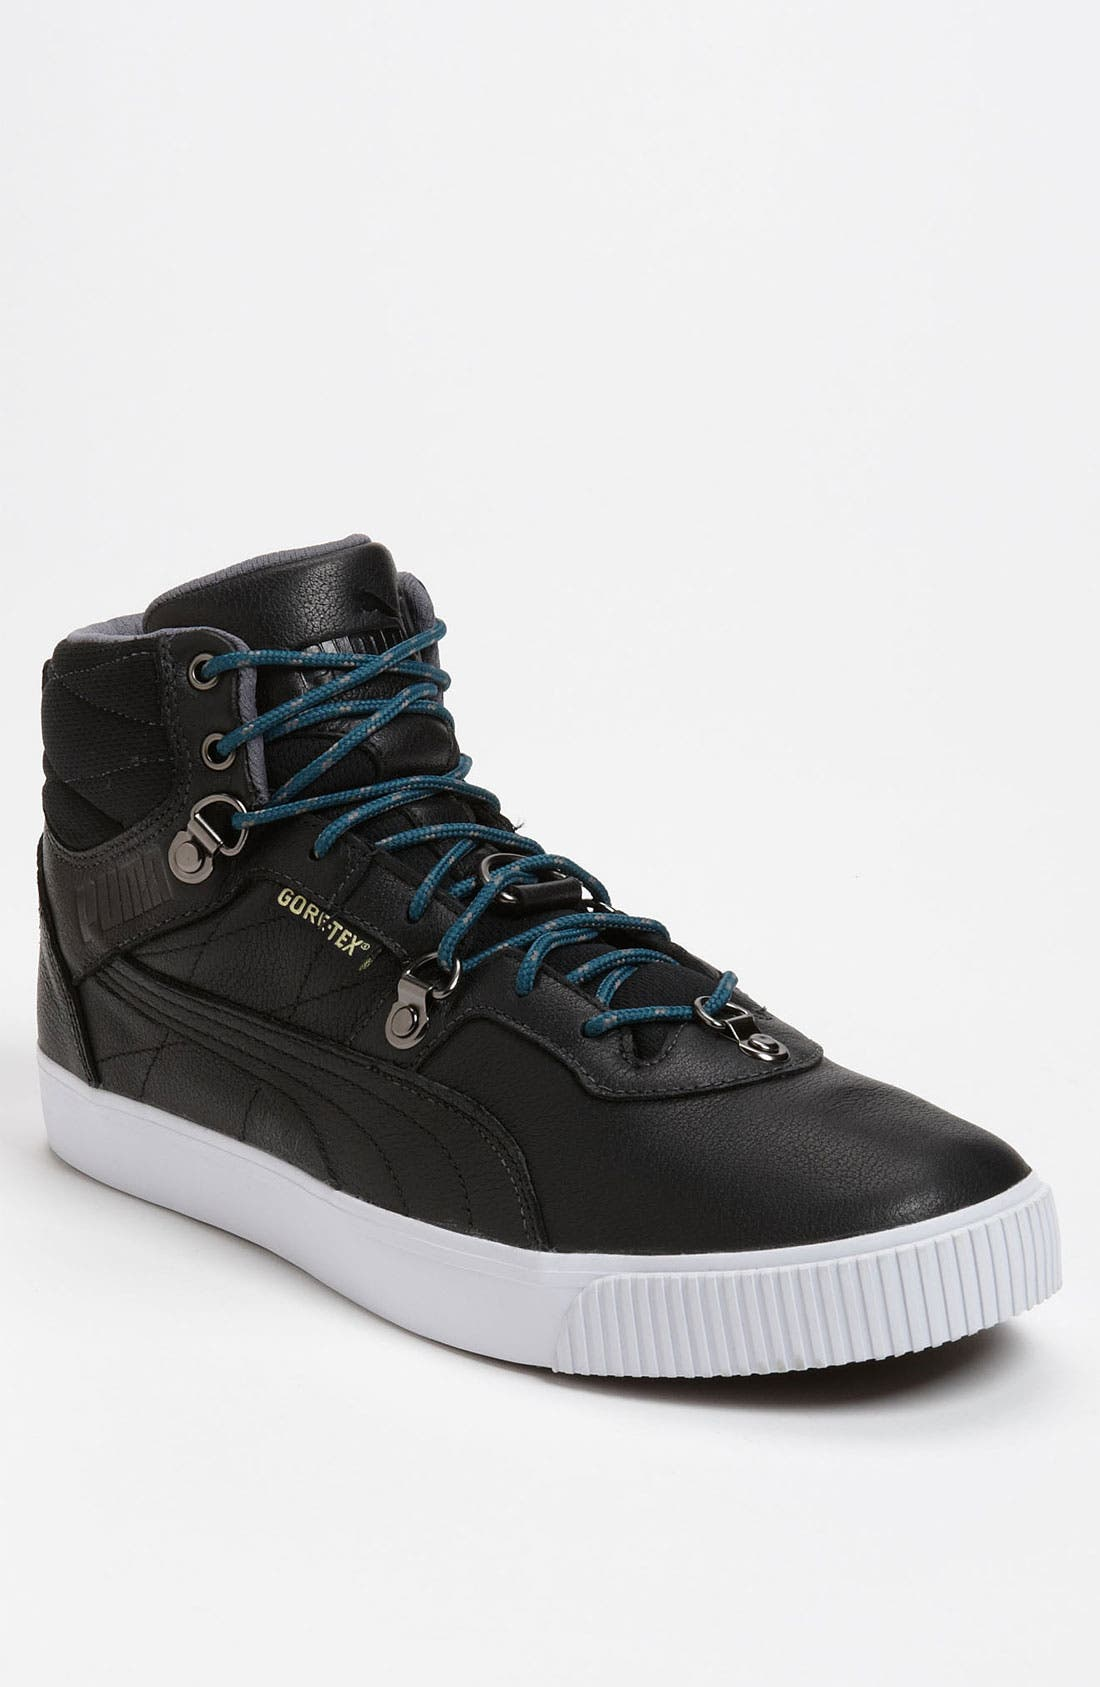 Alternate Image 1 Selected - PUMA 'Tipton GTX' Sneaker (Men) (Online Exclusive)